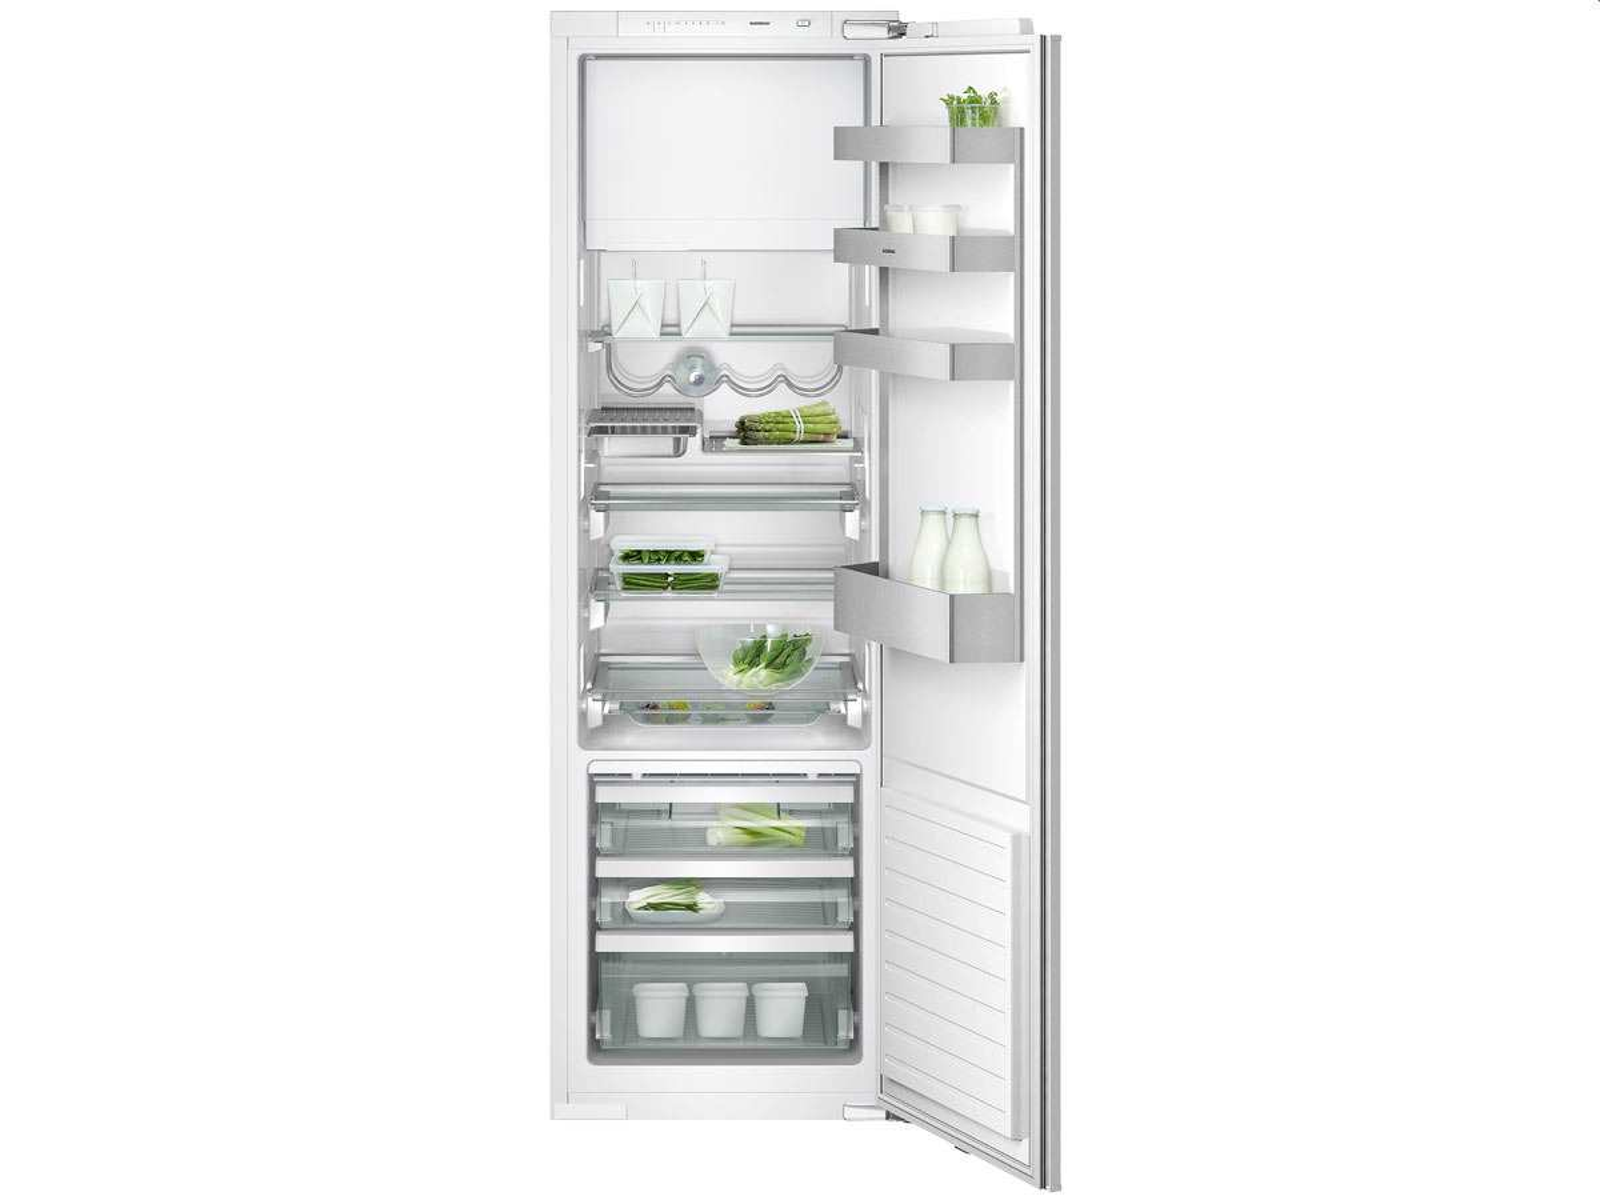 Gaggenau rt 289 203 serie 200 einbaukuhlschrank for Gaggenau kühlschrank